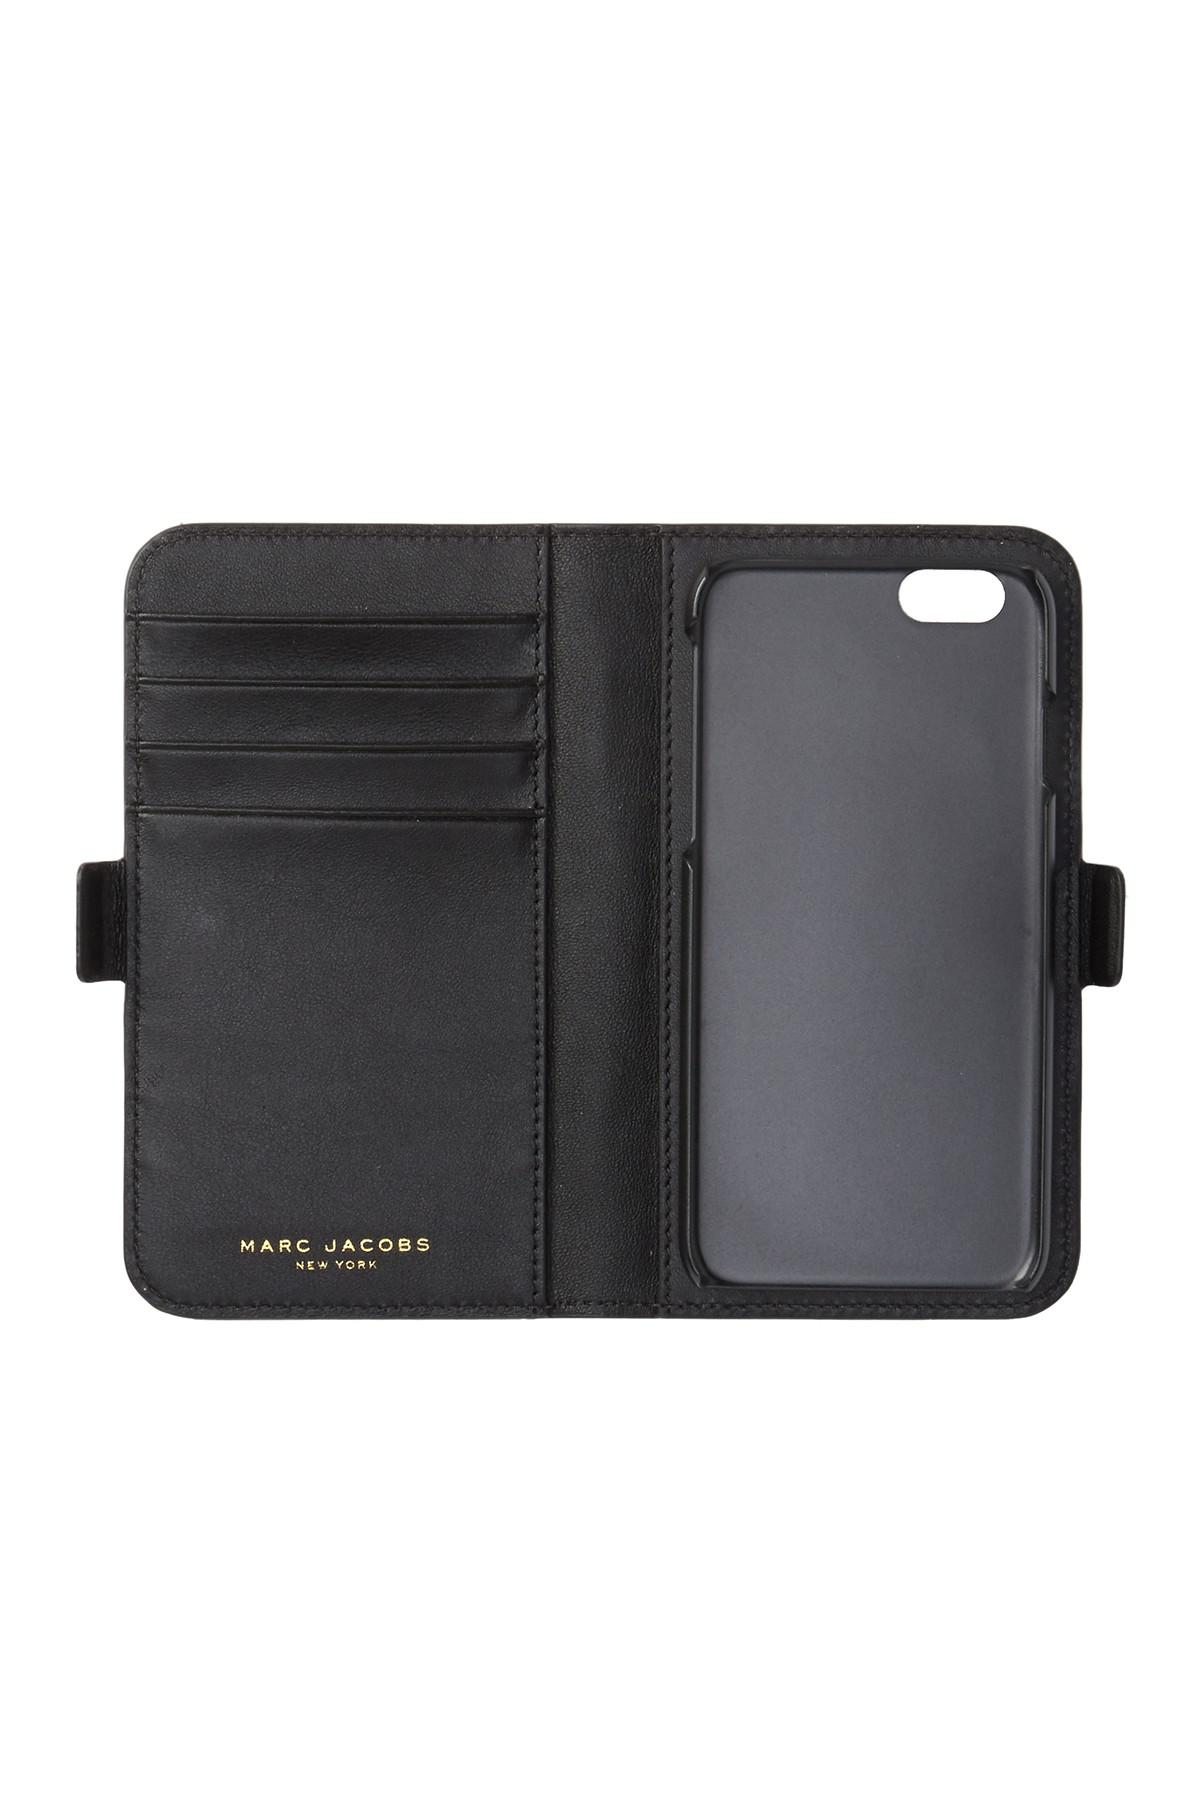 5cd3f22009400 Lyst - Marc Jacobs Landscape Tech Iphone 6 6s Wallet